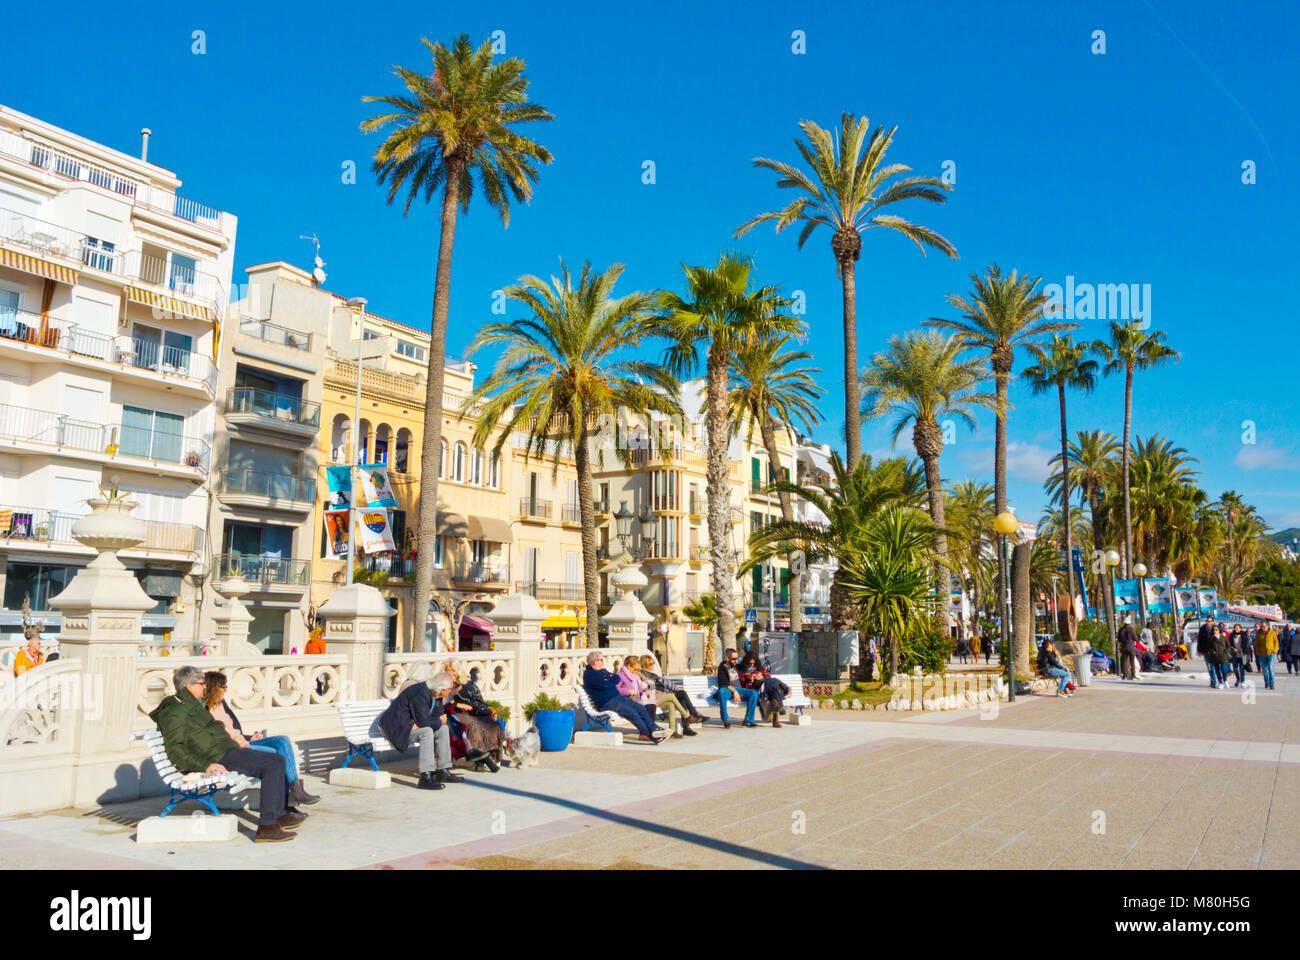 Passeig de la Ribera, Sitges, Catalonia, Spain - Stock Image